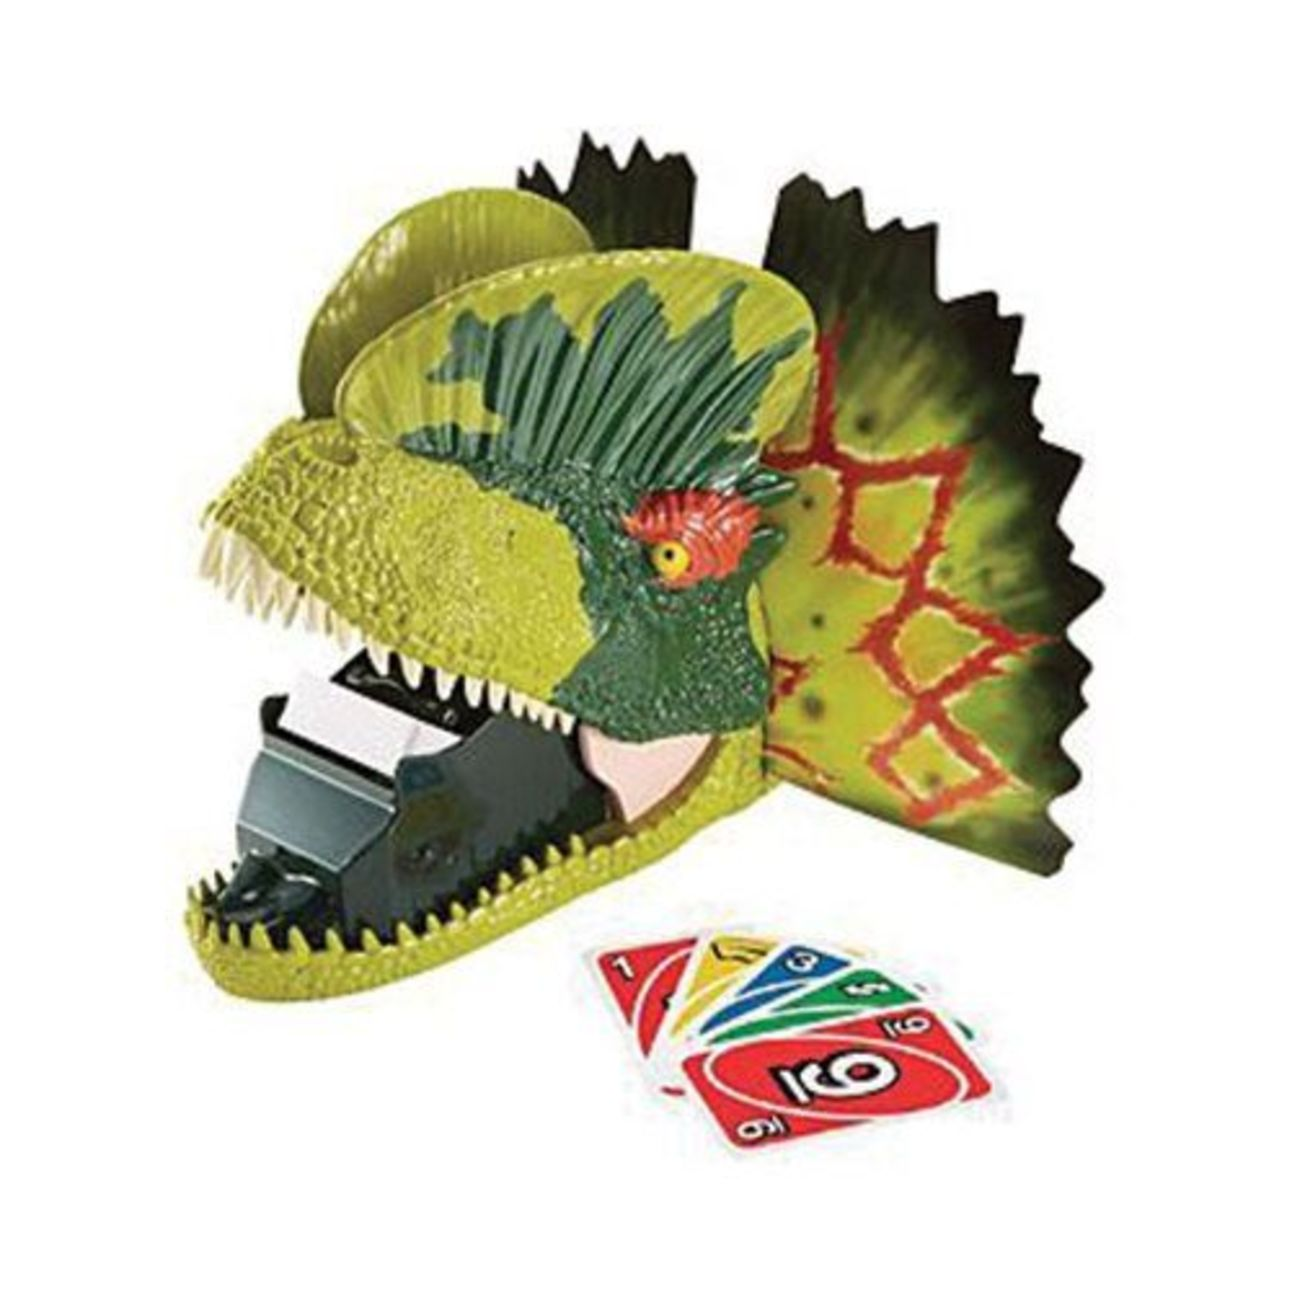 Jurassic Park Uno Game